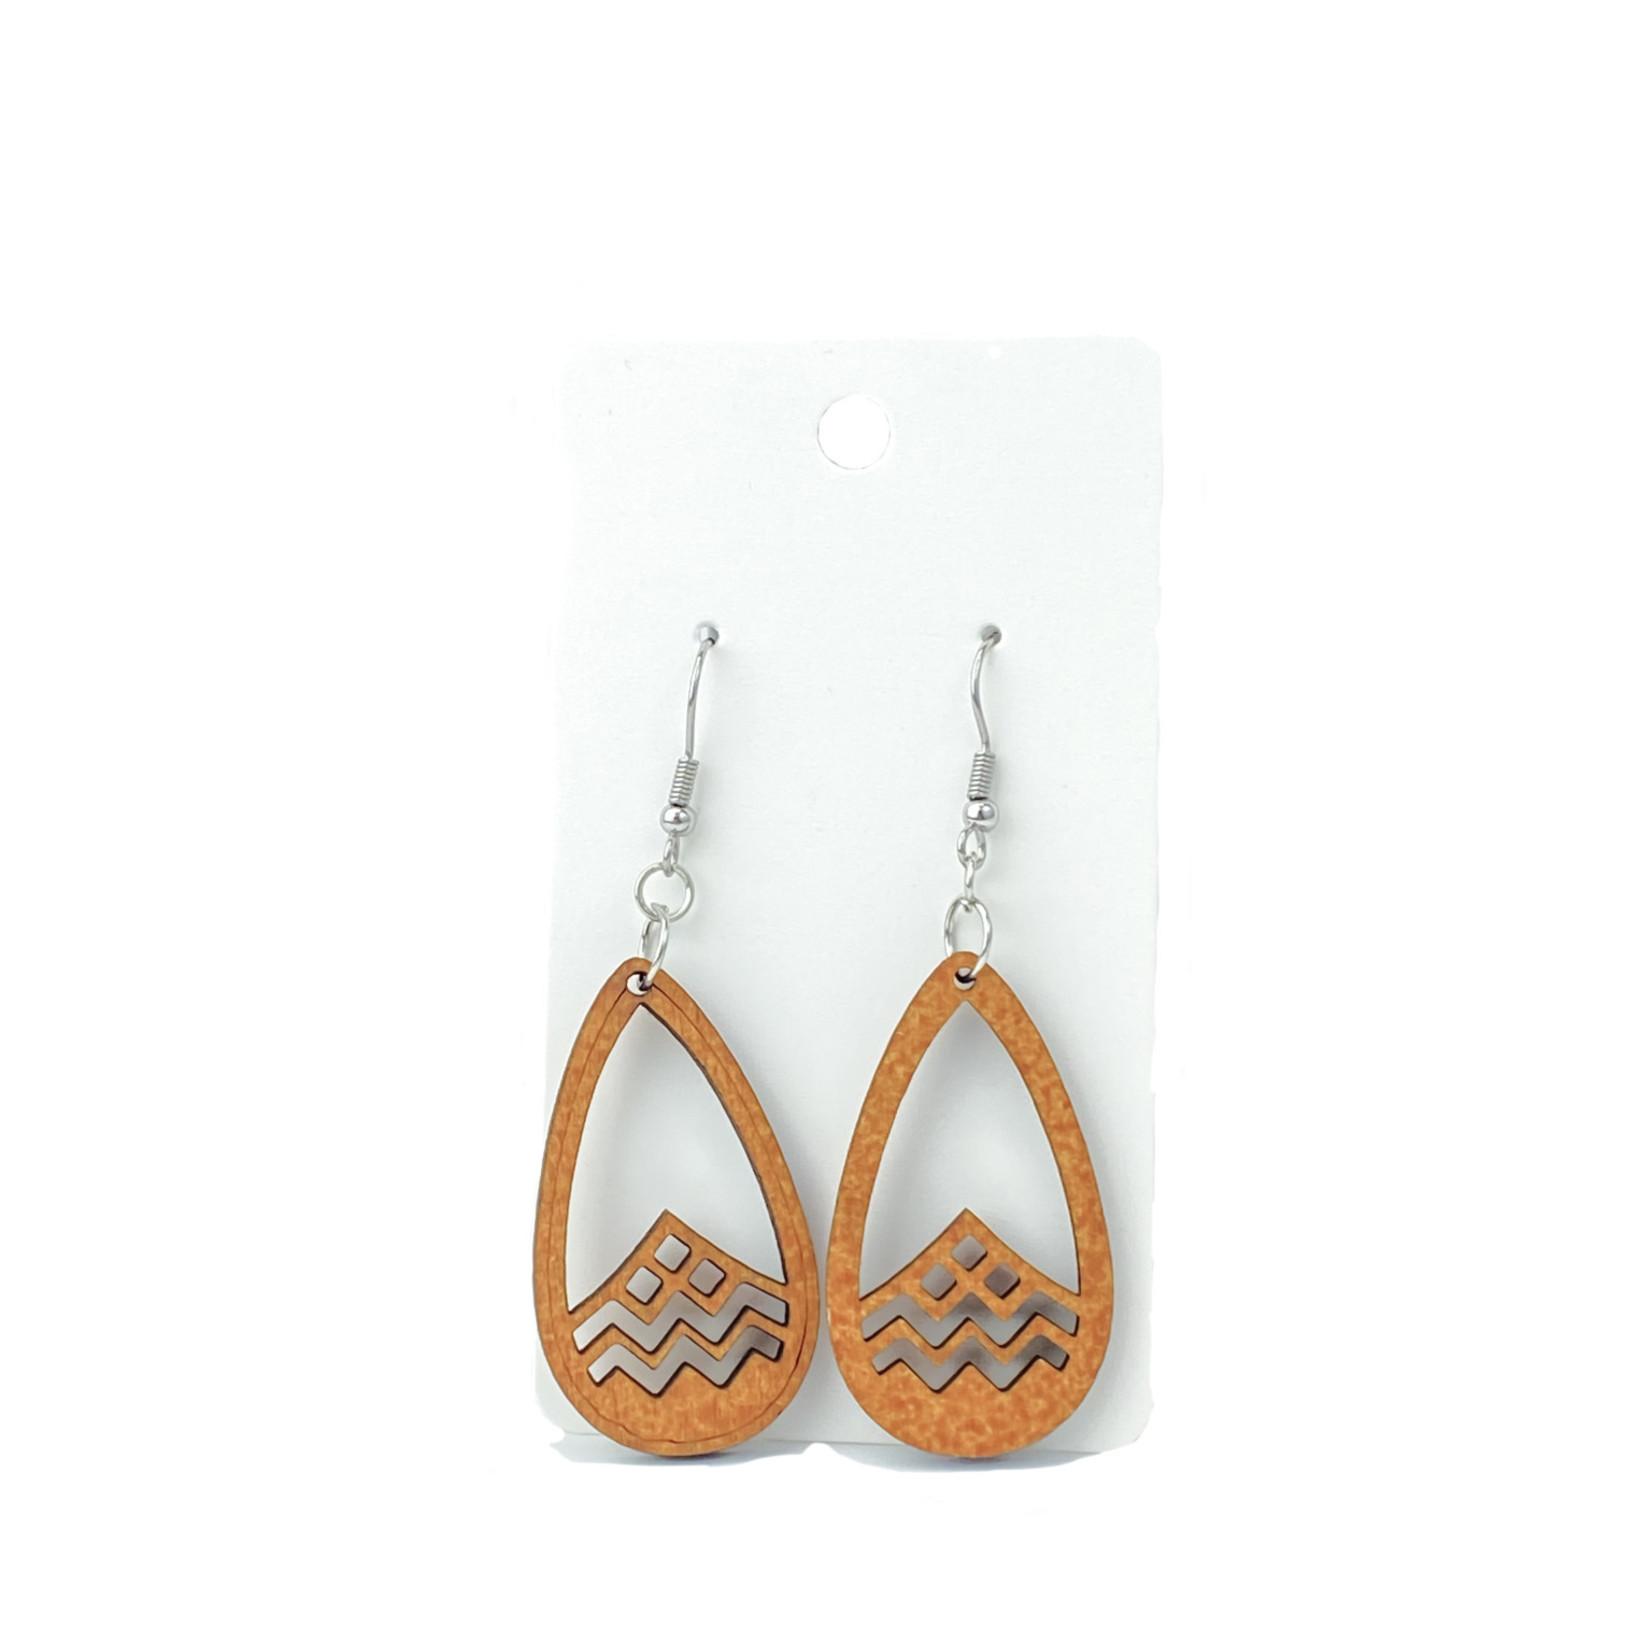 Carved Dangly Earrings -